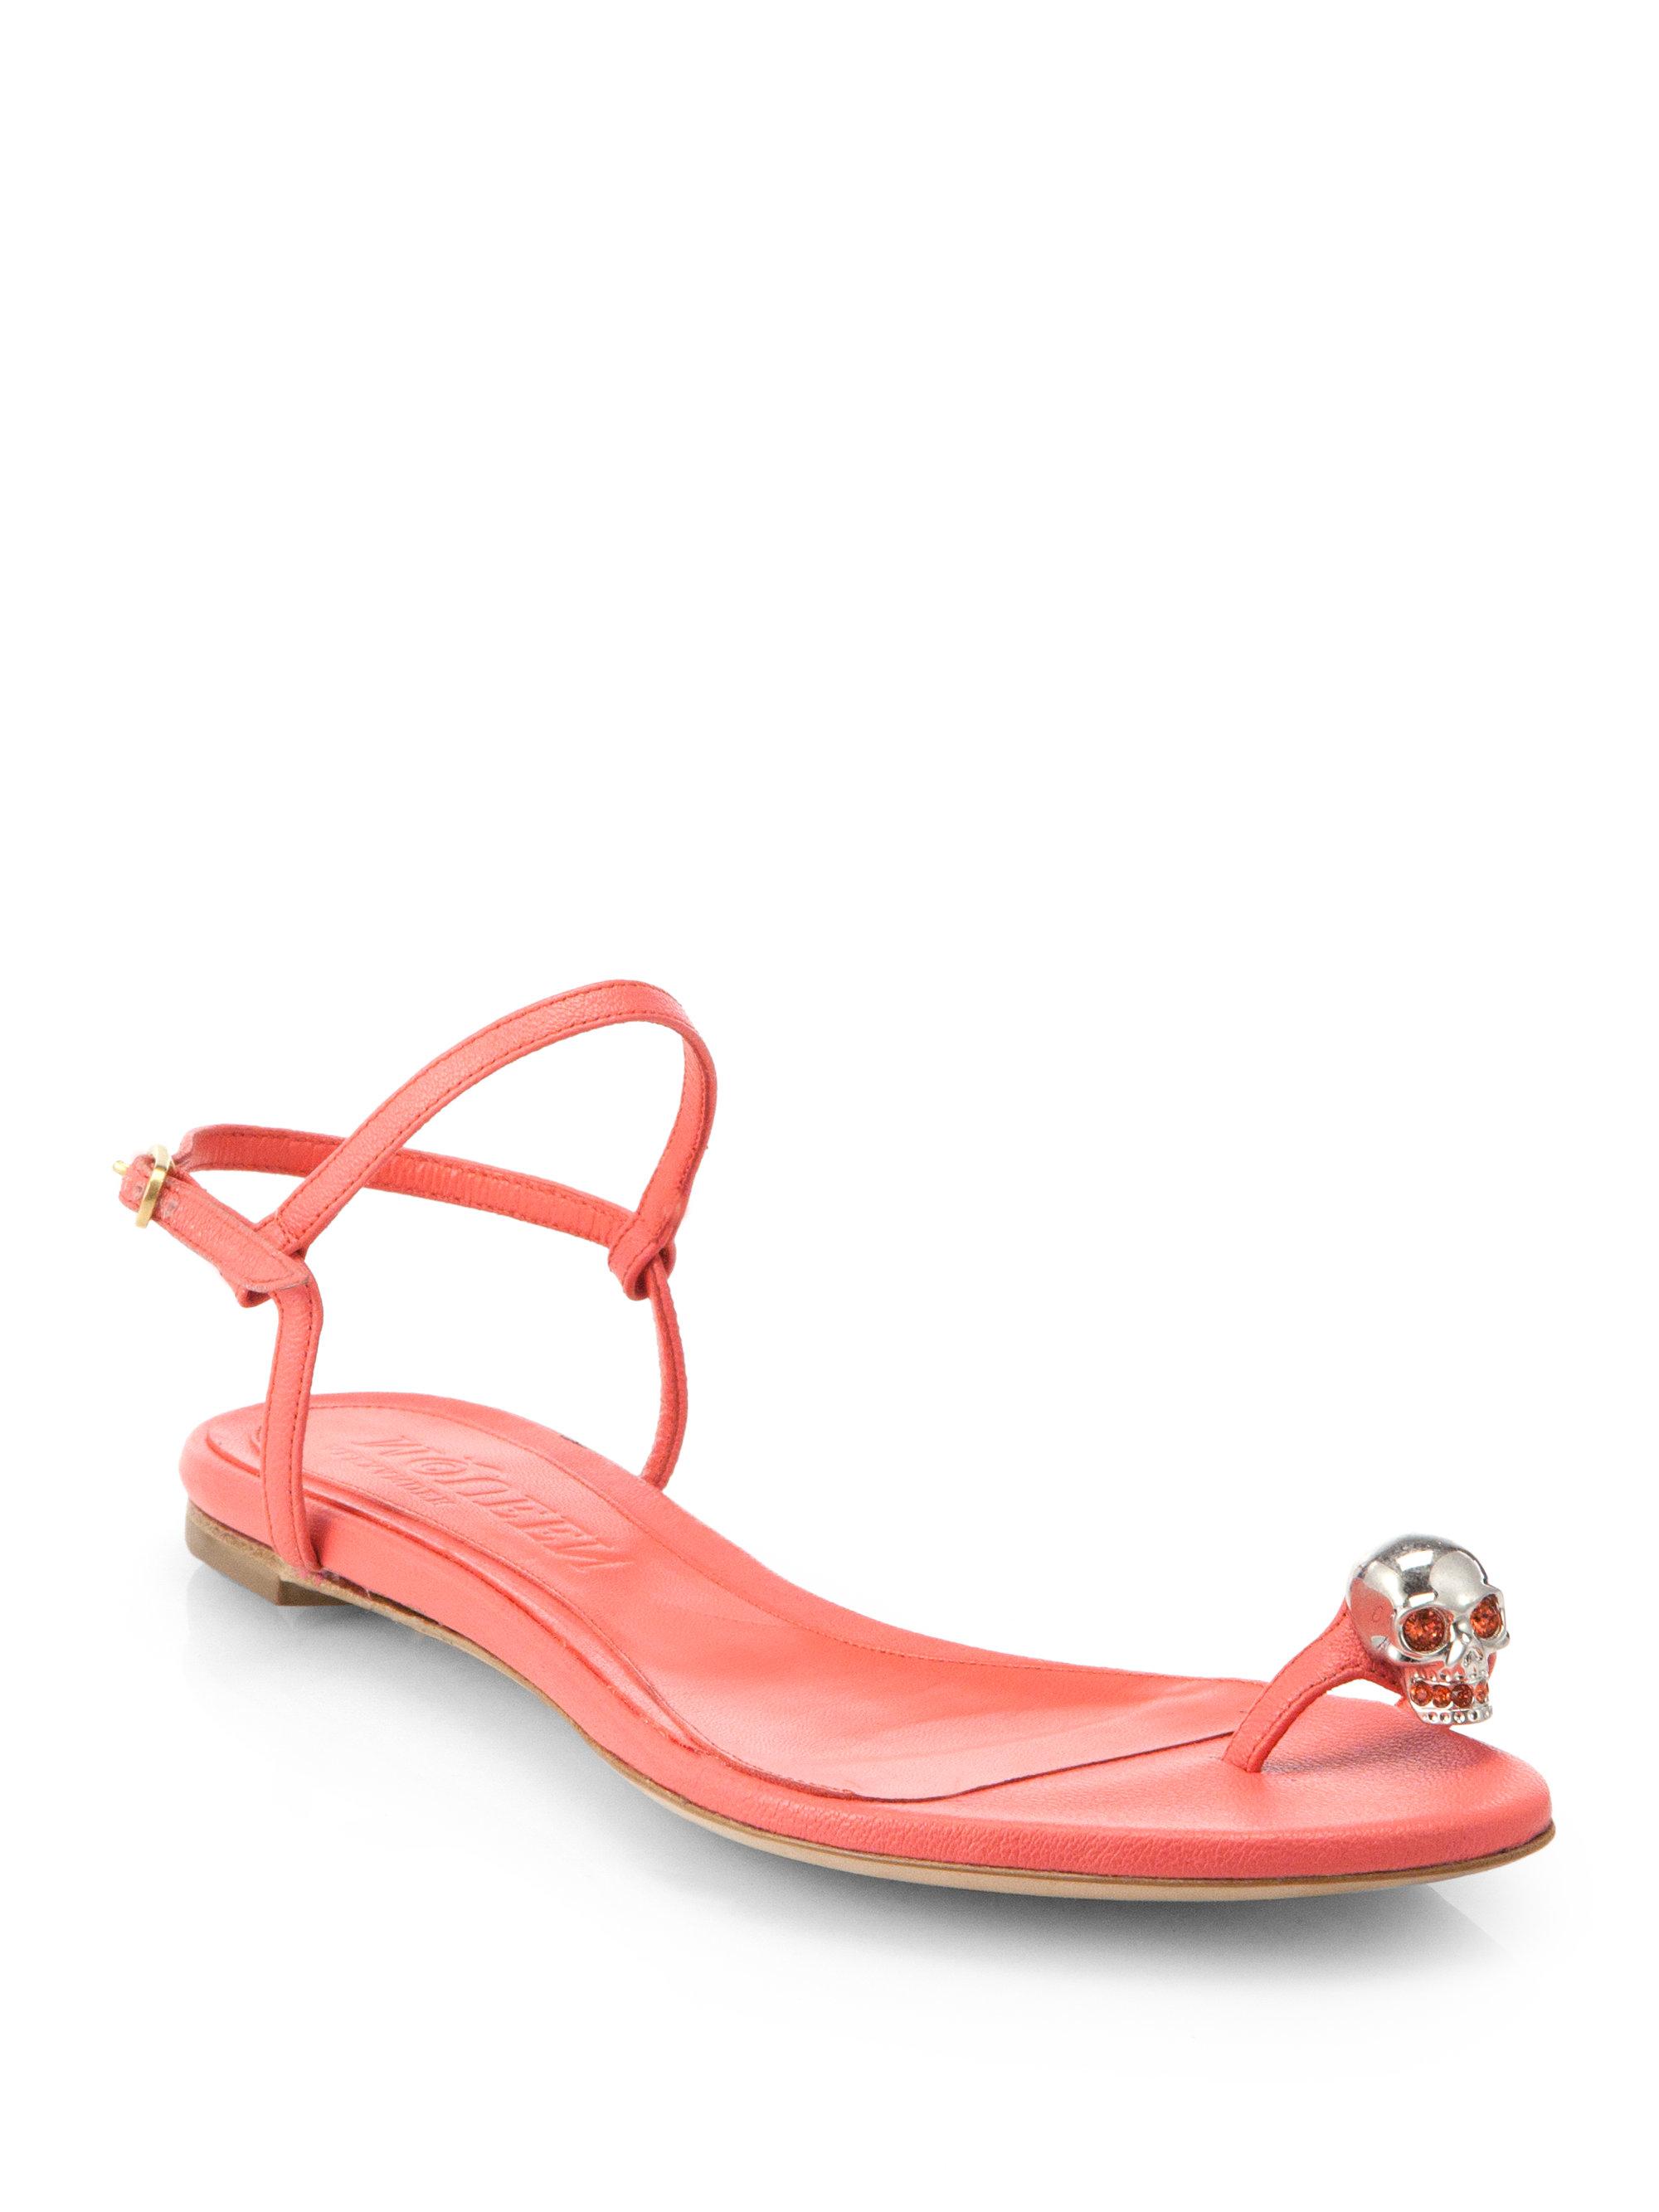 Blue Inc Toe Ring Sandals Uk